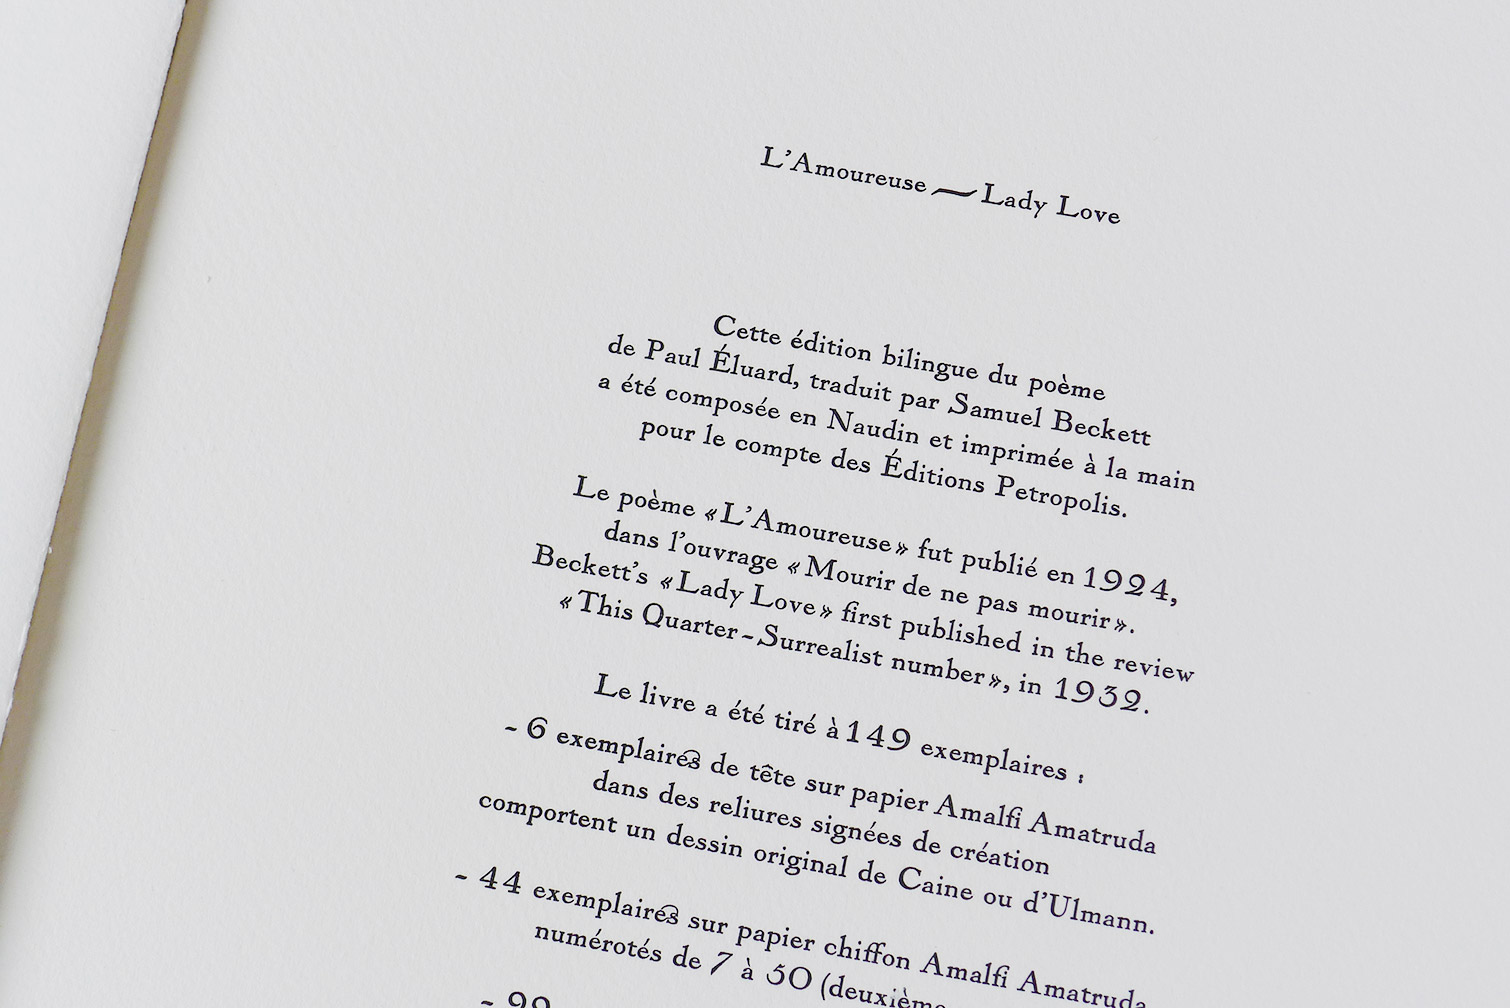 Paul Eluard Samuel Beckett Lamoureuse Lady Love